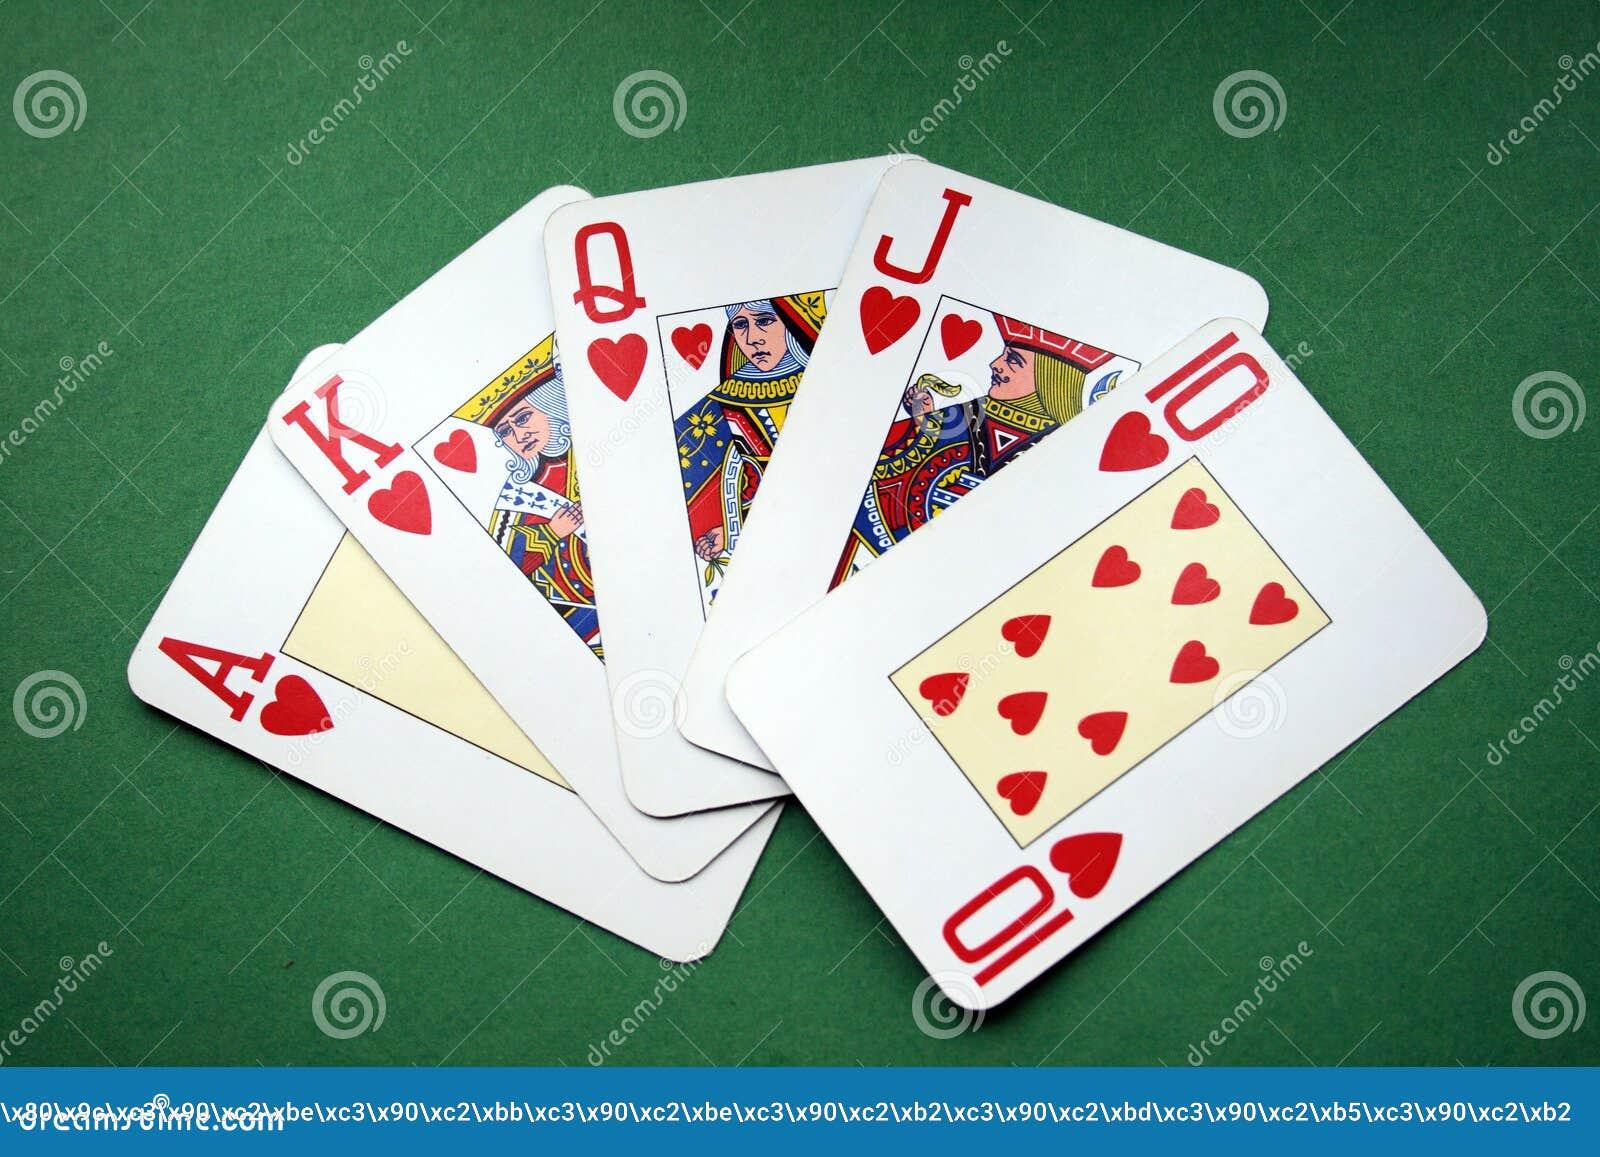 Royal Flash Poker